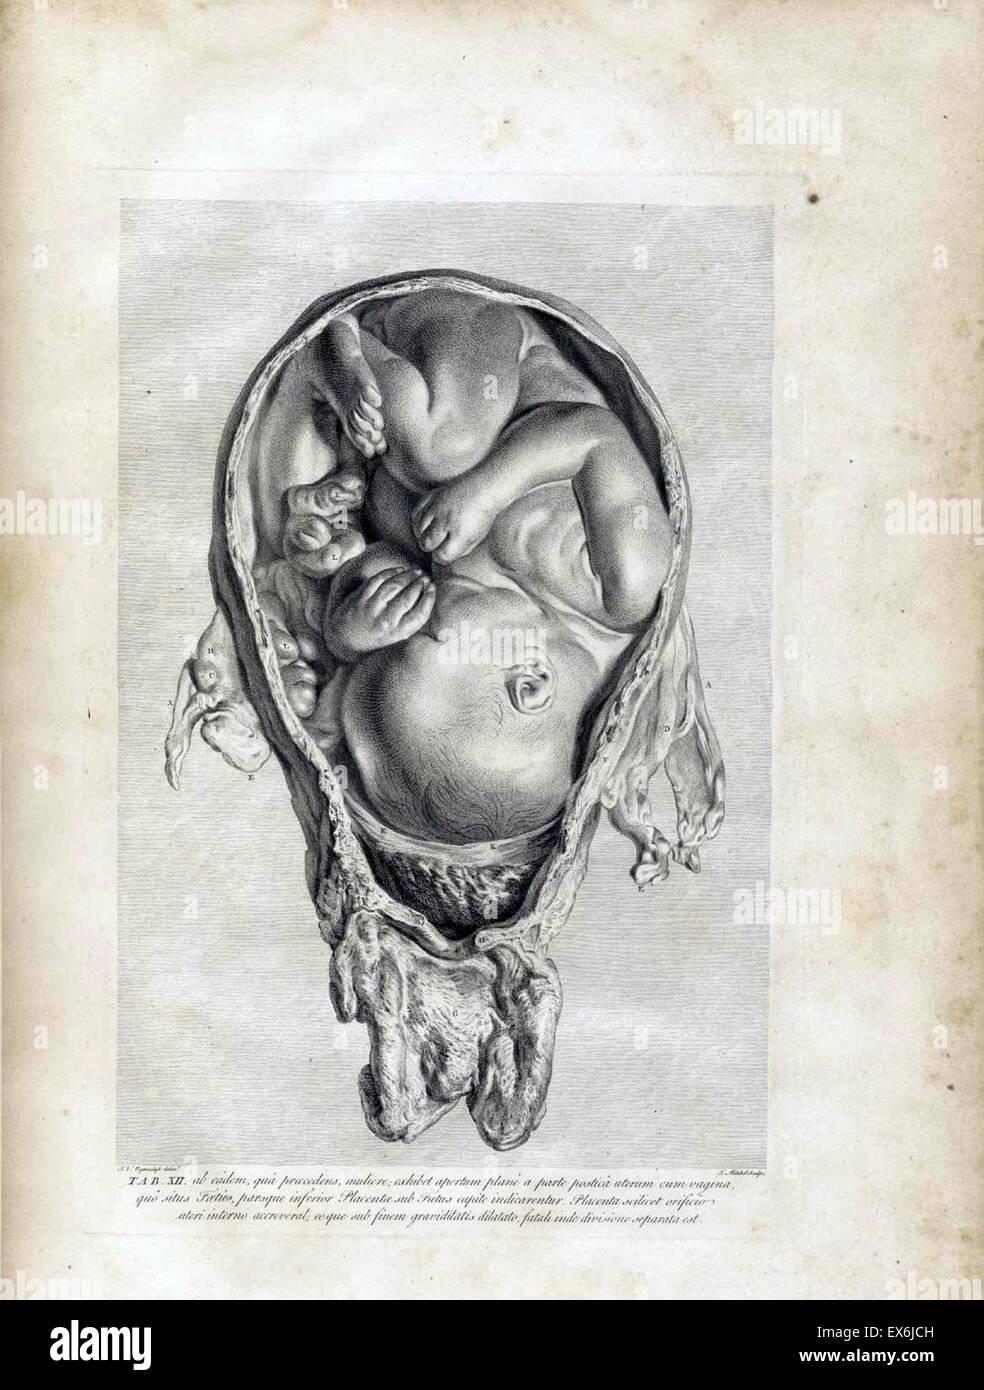 anatomical illustrations from \'Anatomia uteri humani gravidi tabulis ...